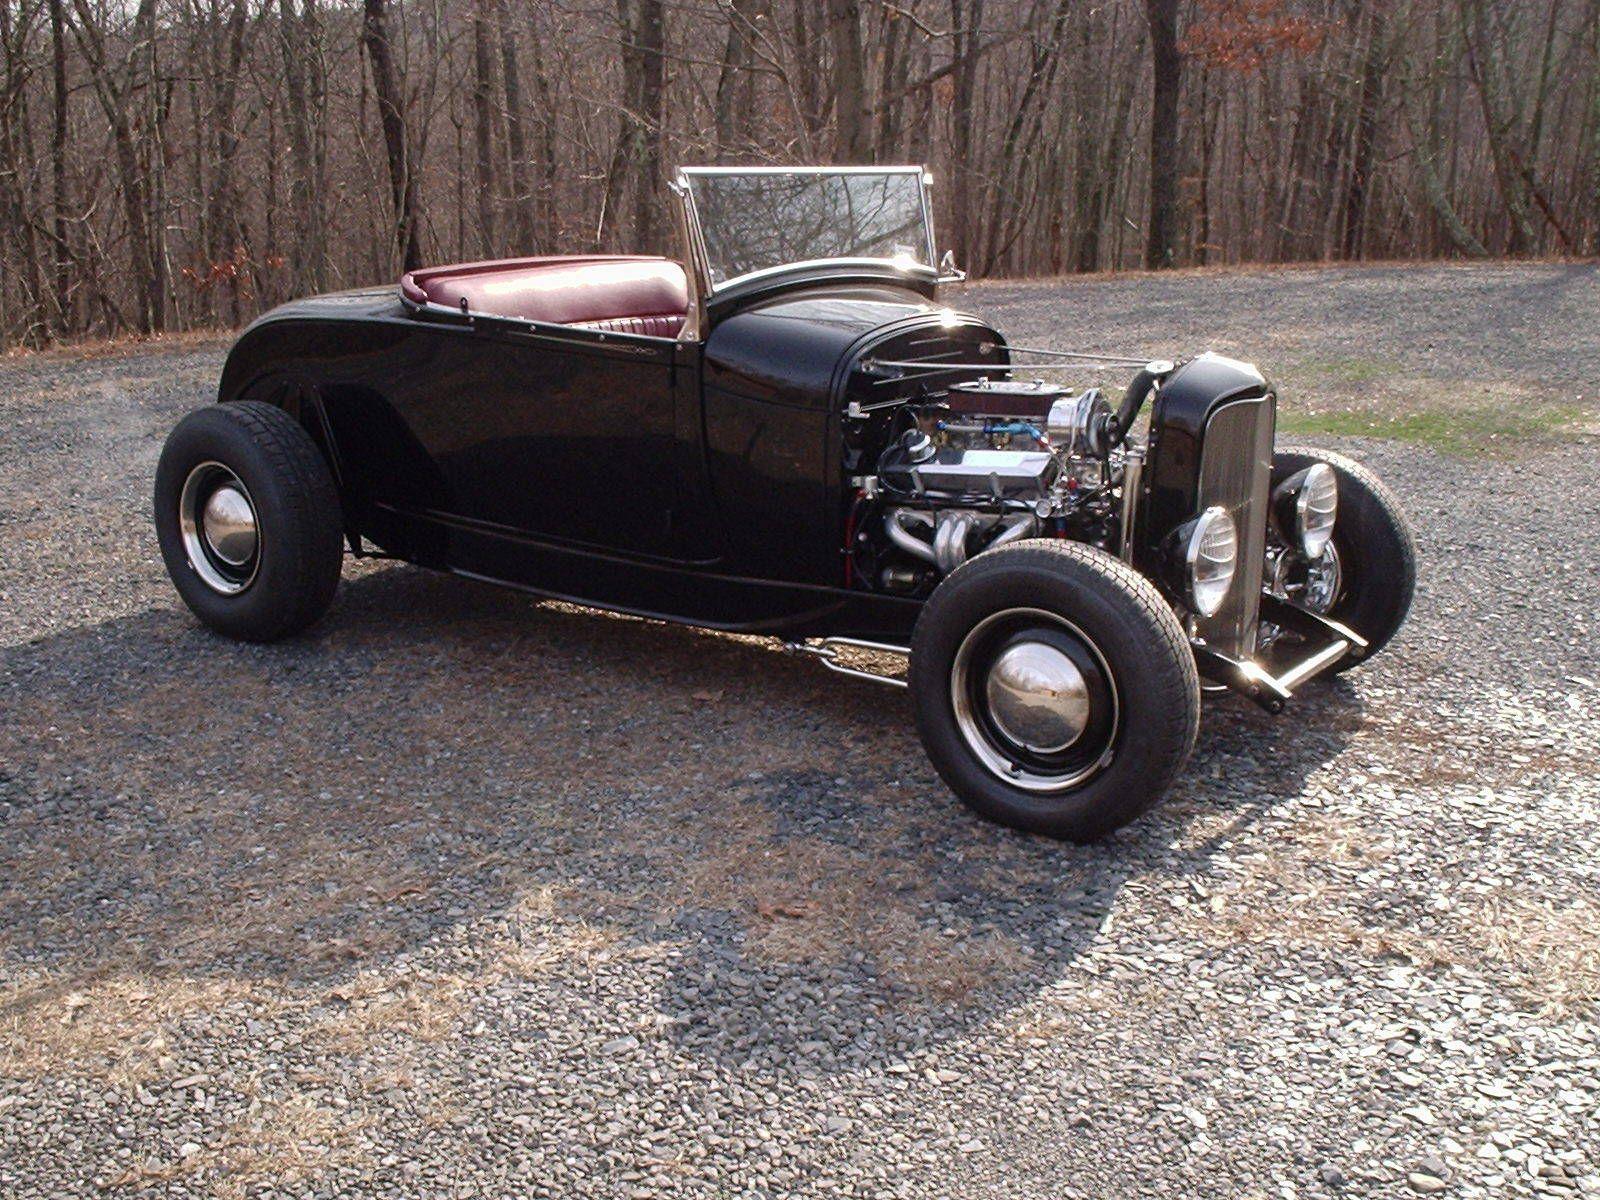 1929 ford a v8 hot rod roadster all steel on 32 frame